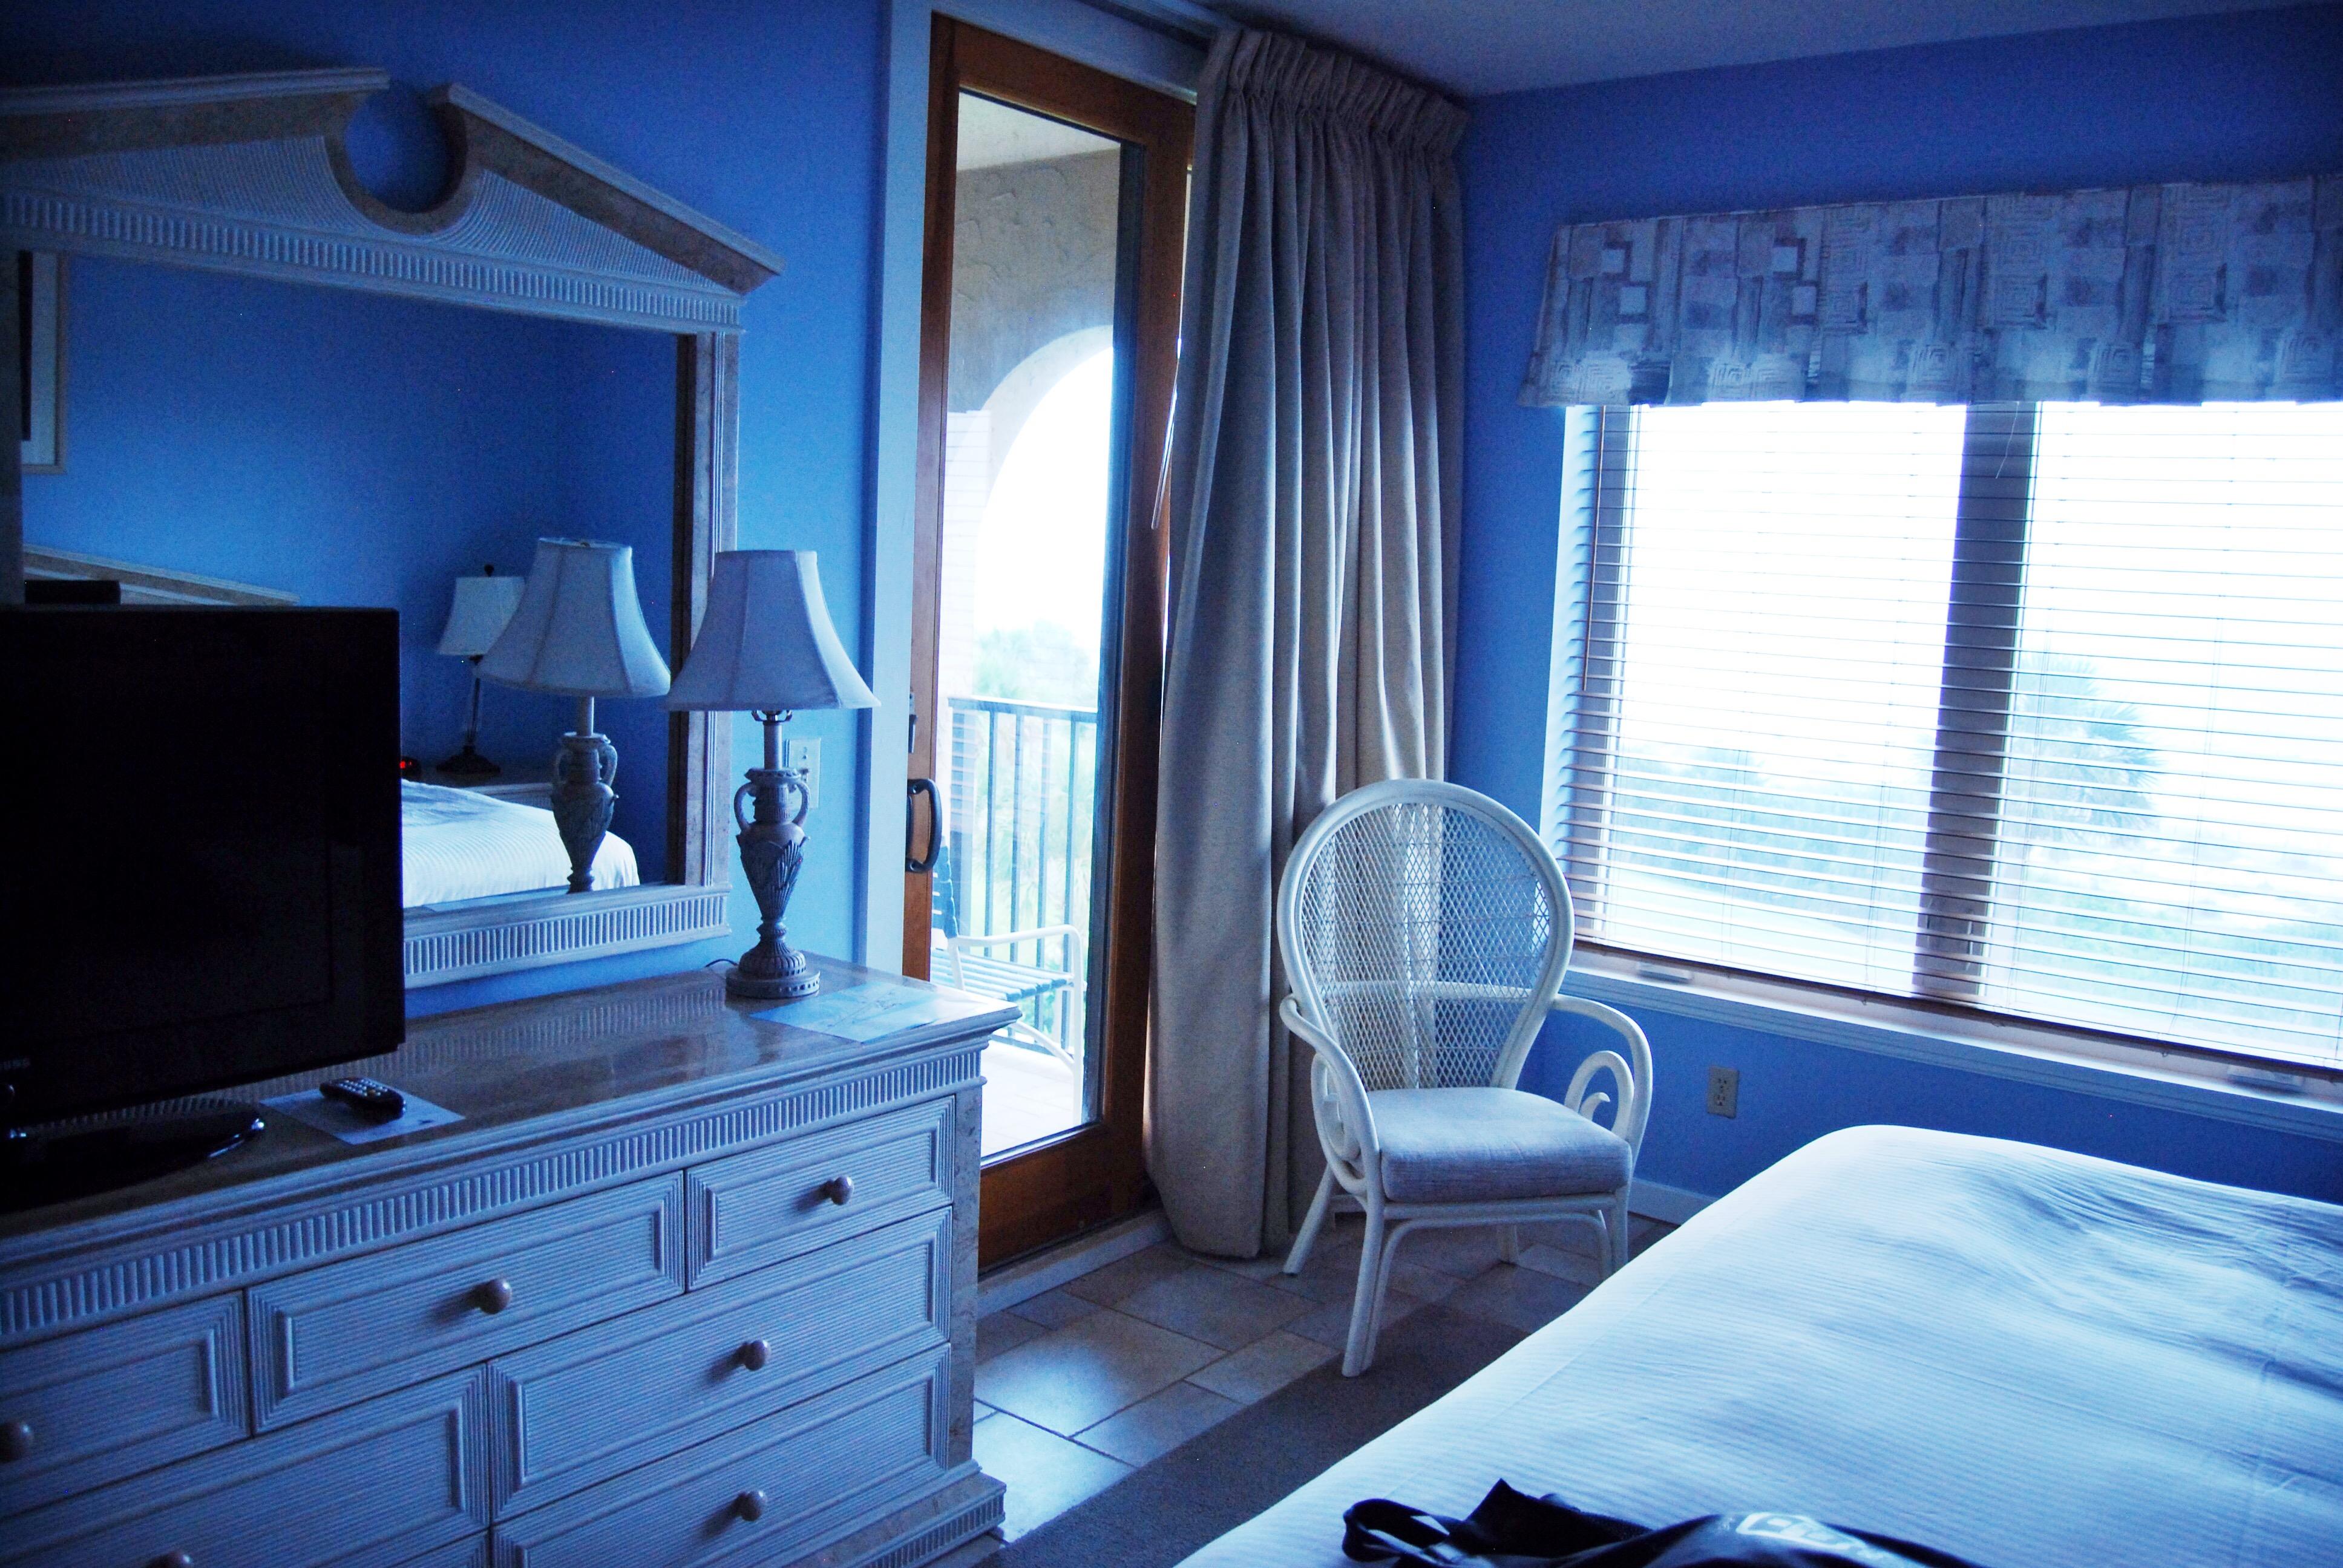 Amelia Island: Omni Amelia Island Plantation Resort | Breezing Through